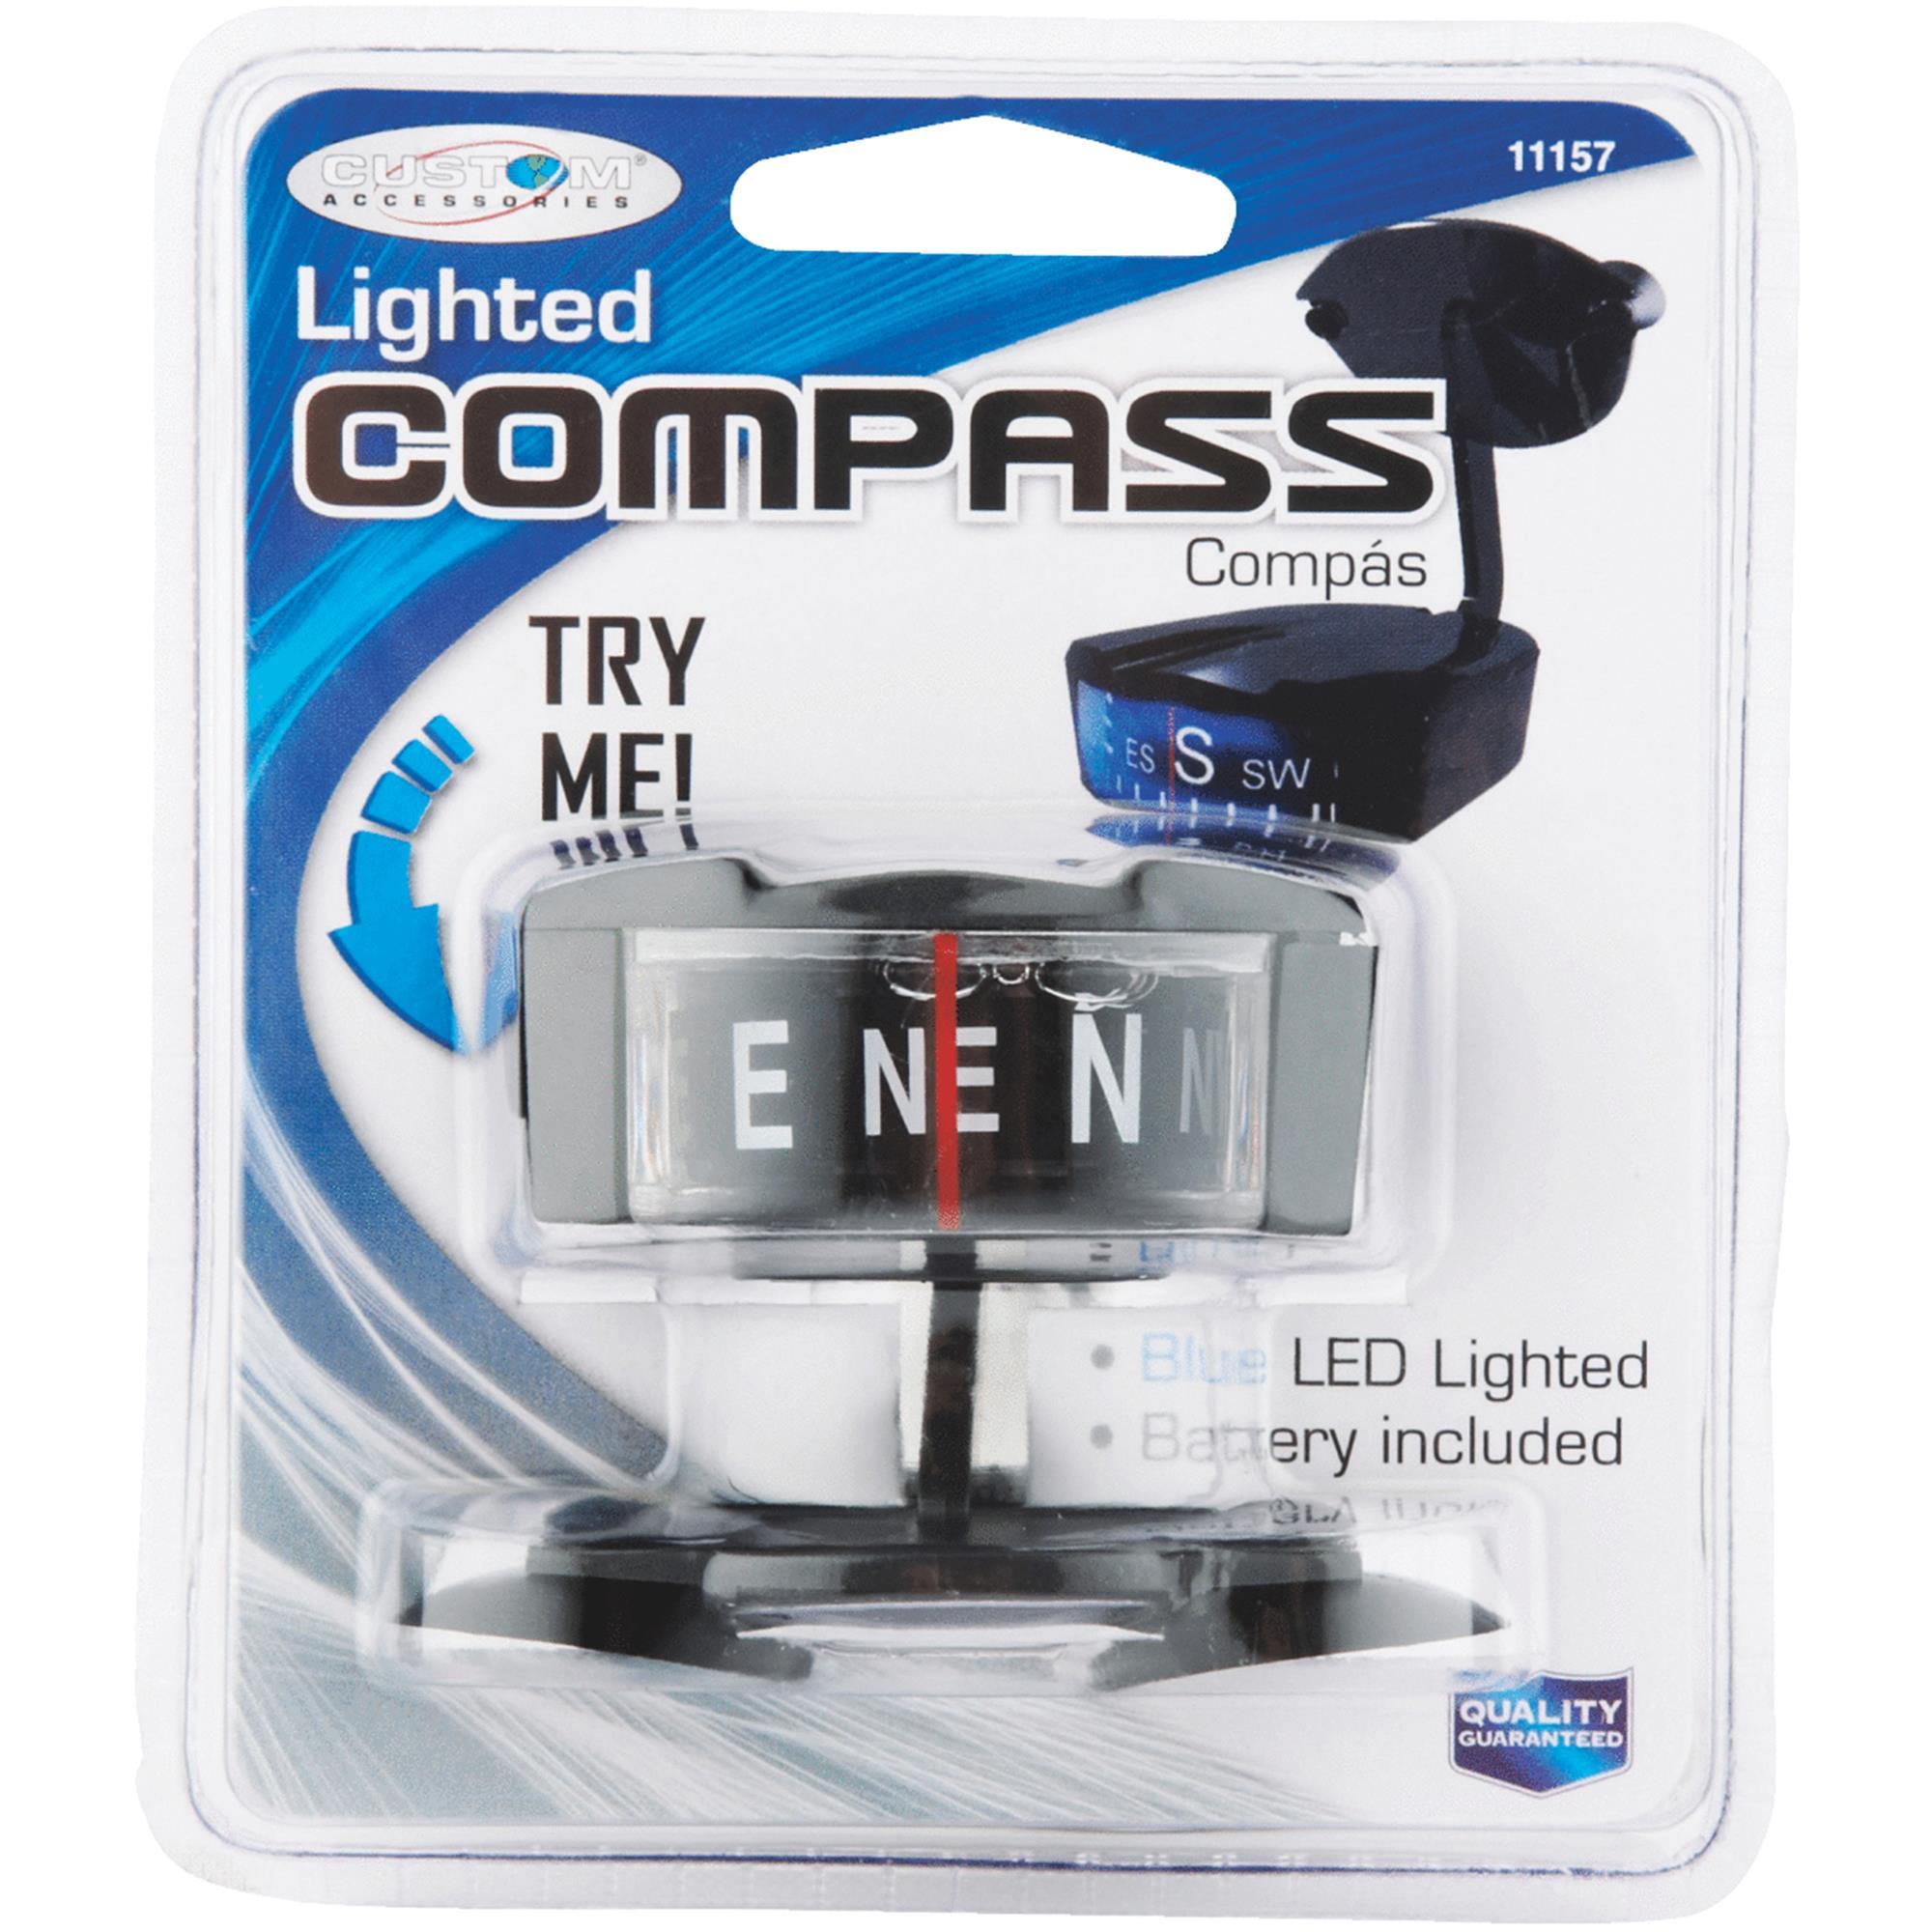 Custom Accessories Lighted Compass